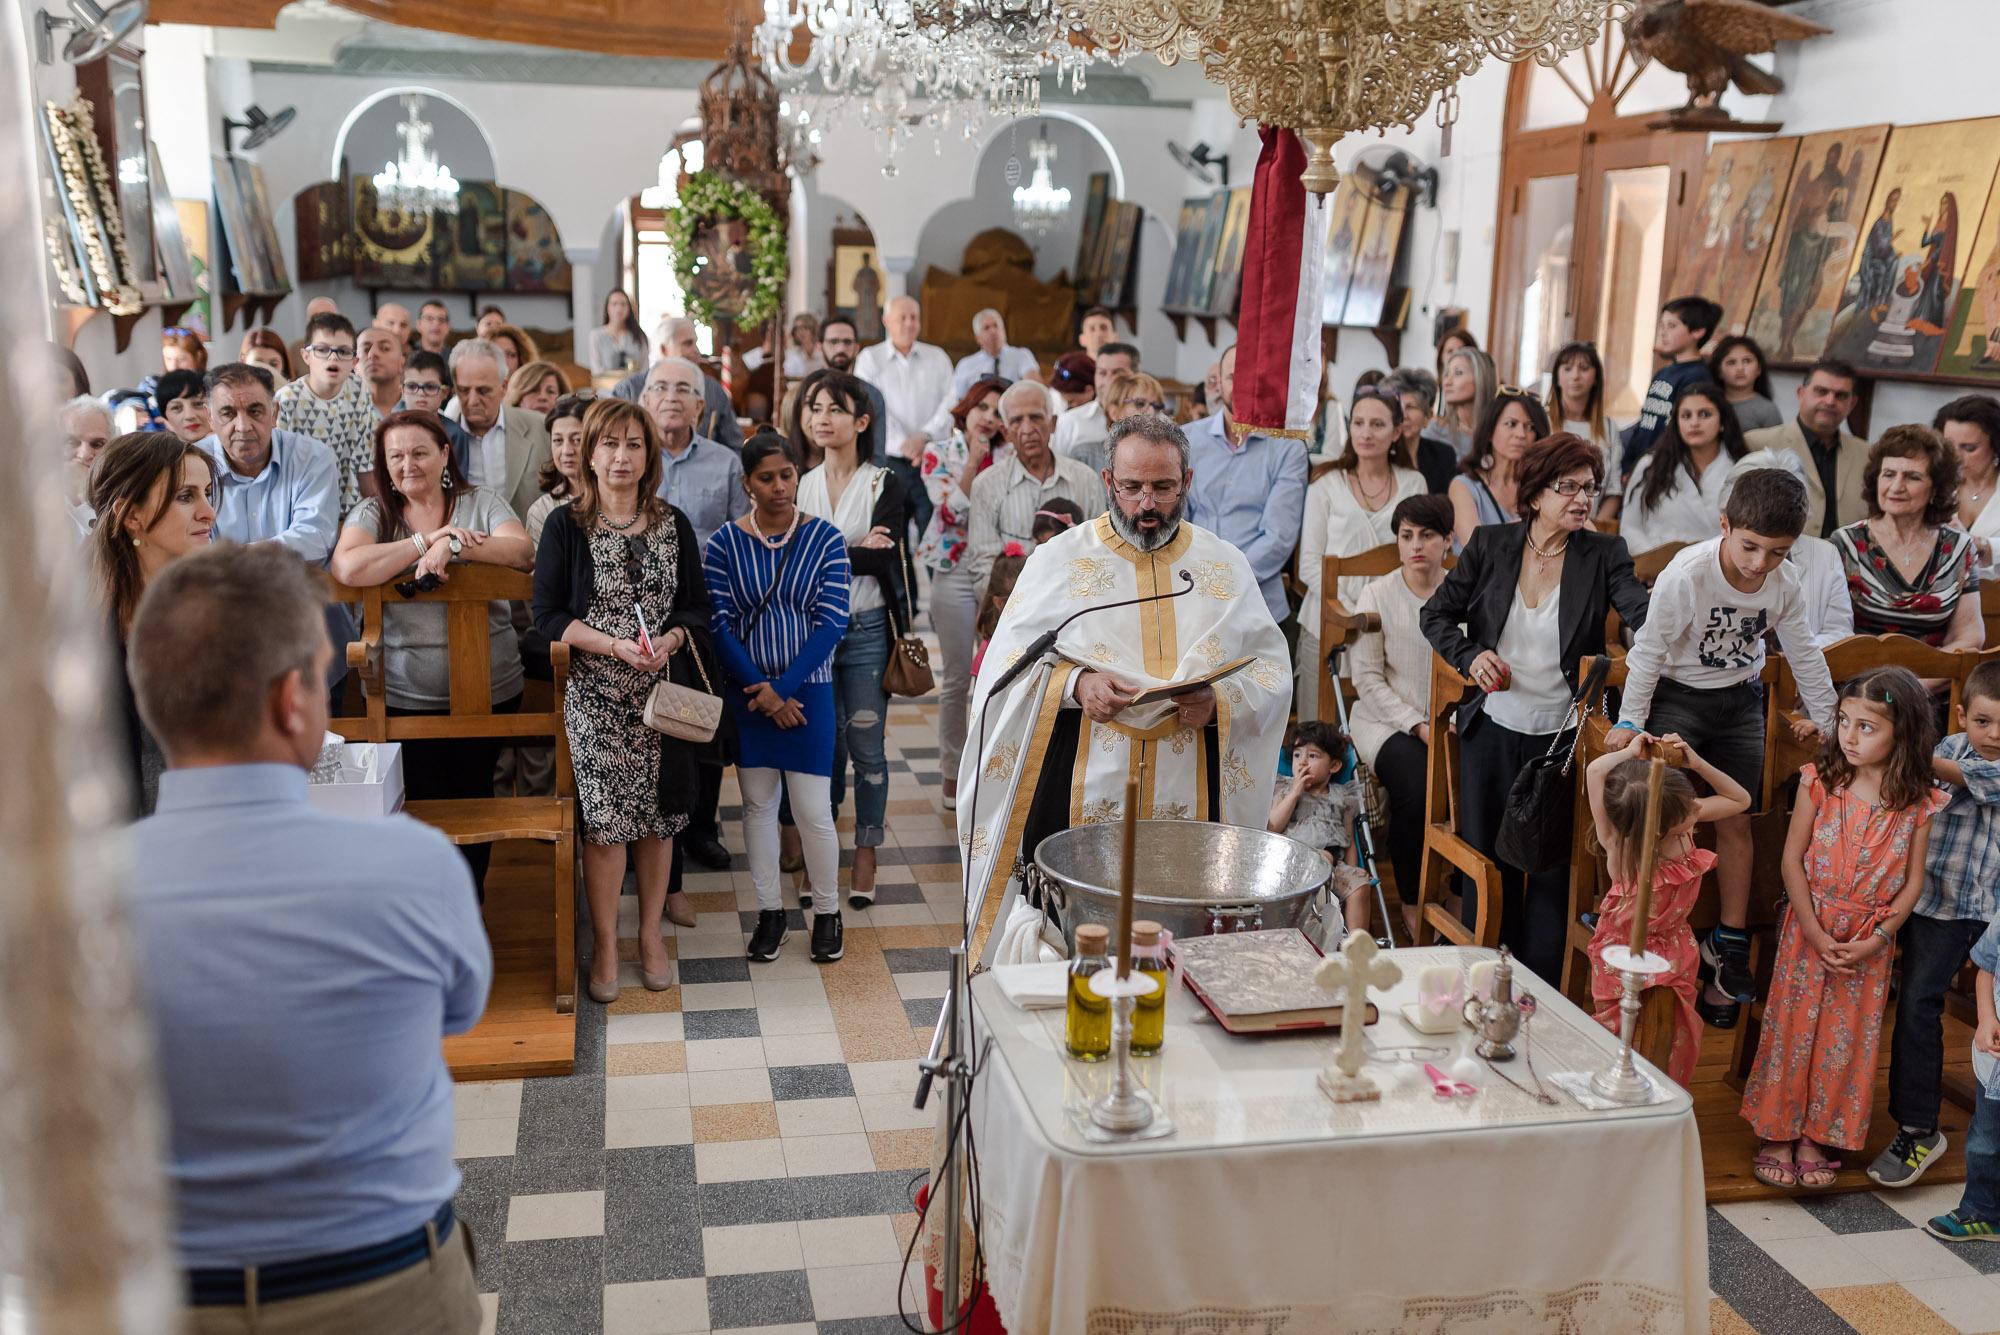 Christening cyprus βαπτιση  κυπρος wide angle view.jpg